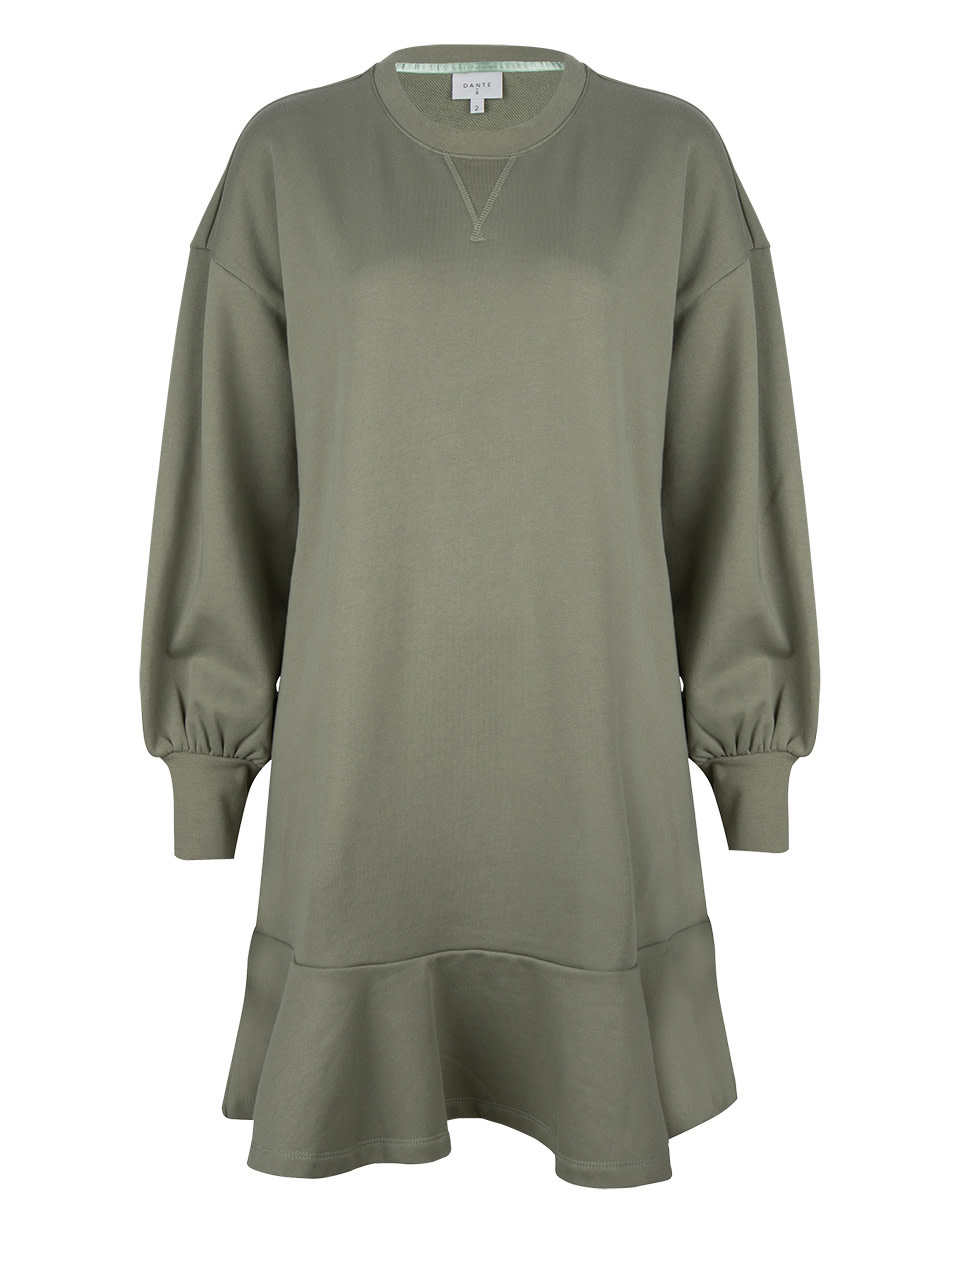 Josefine dress sage green-1